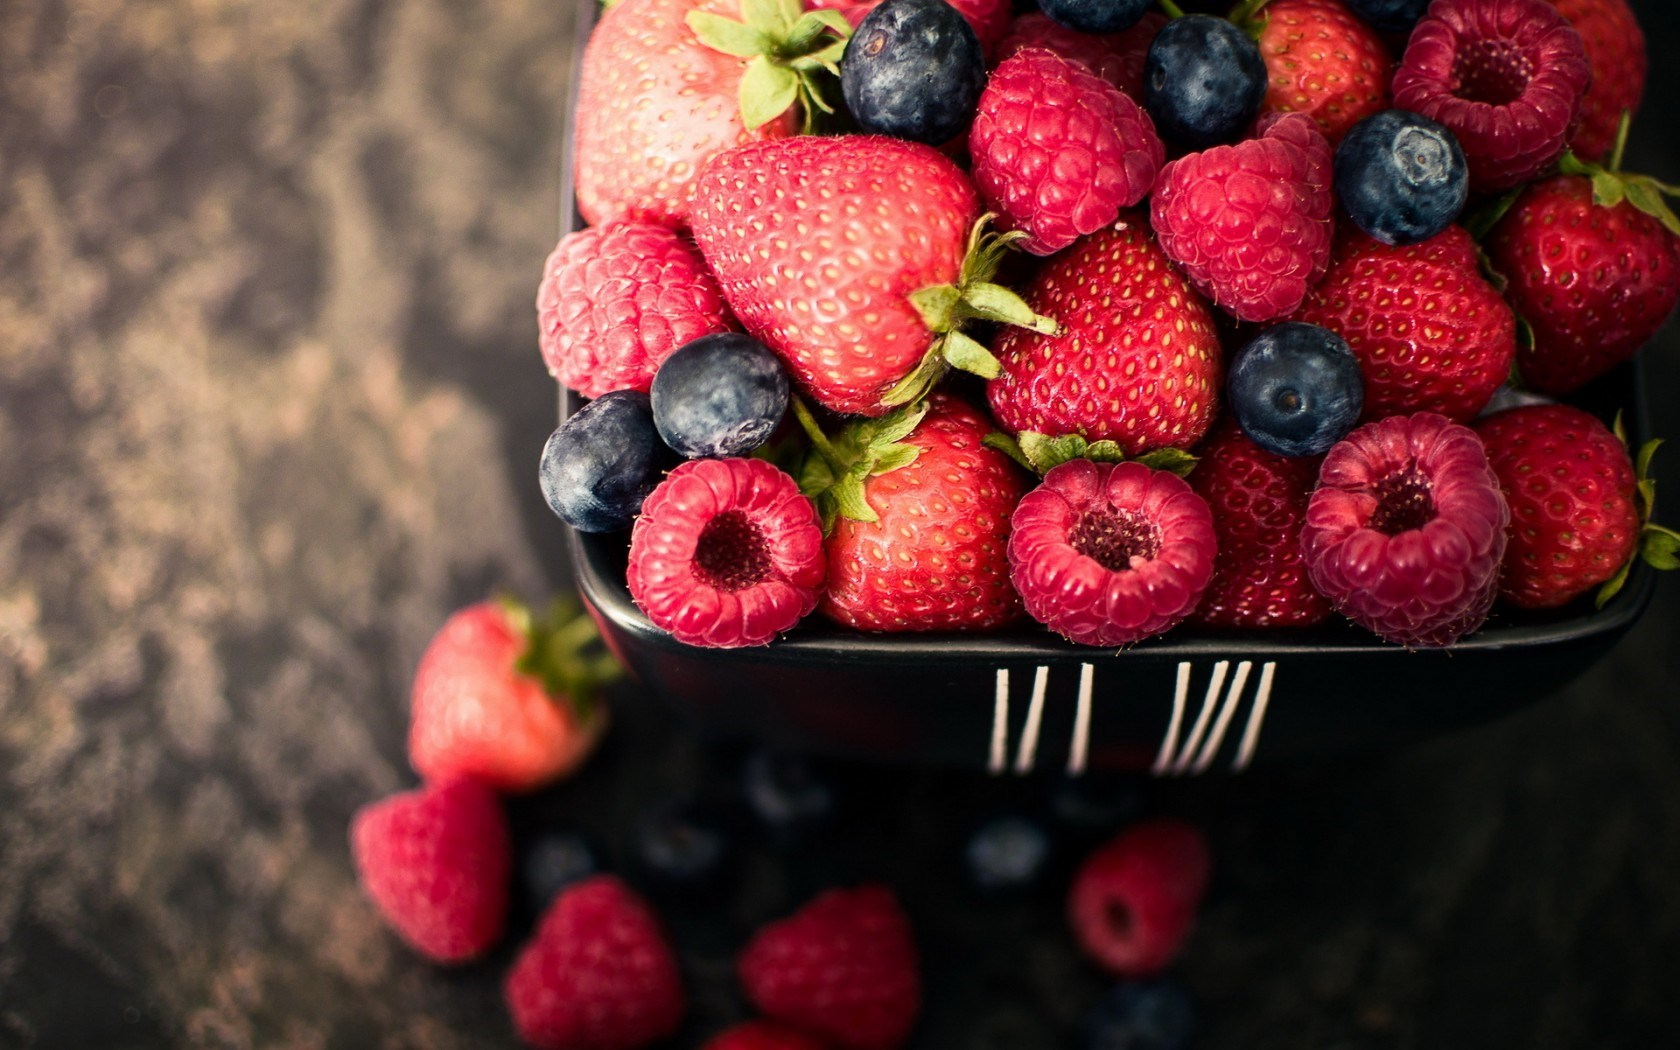 berries-summer-widescreen-high-definition-desktop-wallpaper-background-picture-free